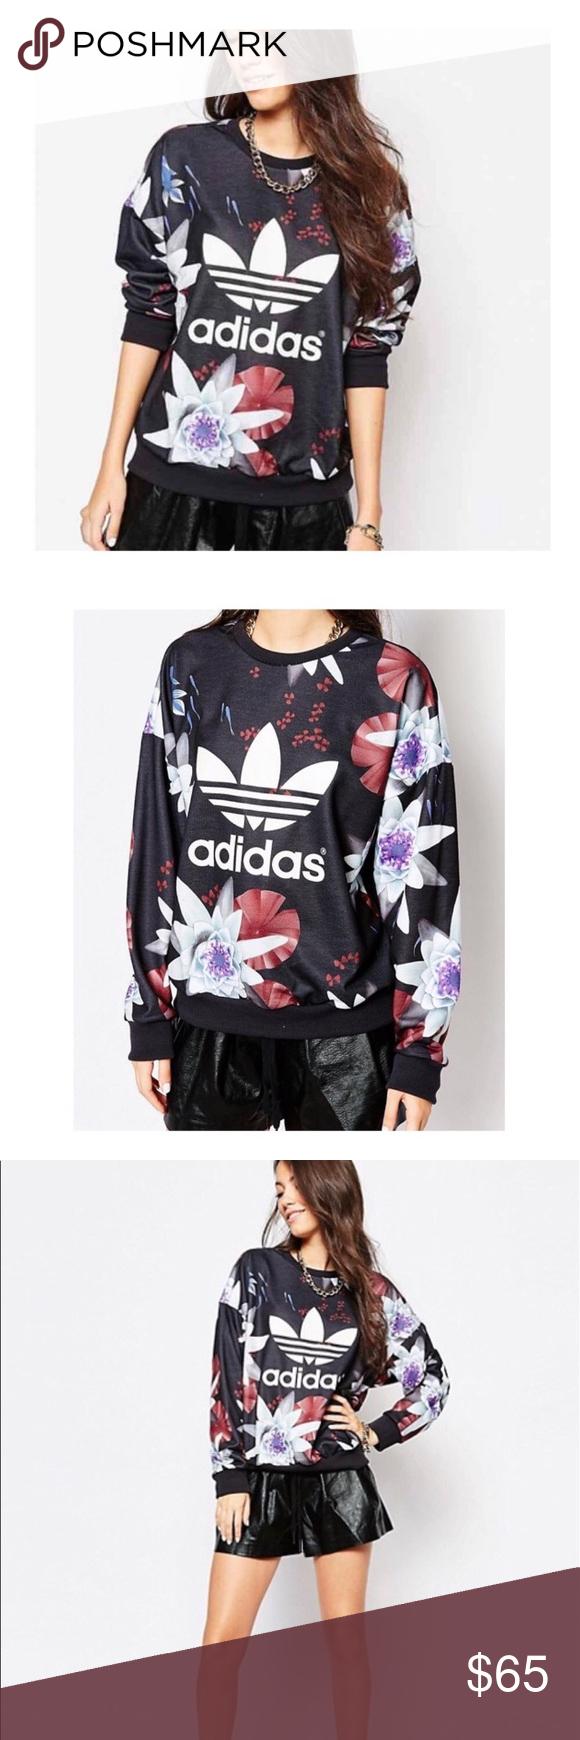 Adidas Limited Edition Lotus Black Sweatshirt Black Sweatshirts Clothes Design Sweatshirts [ 1740 x 580 Pixel ]